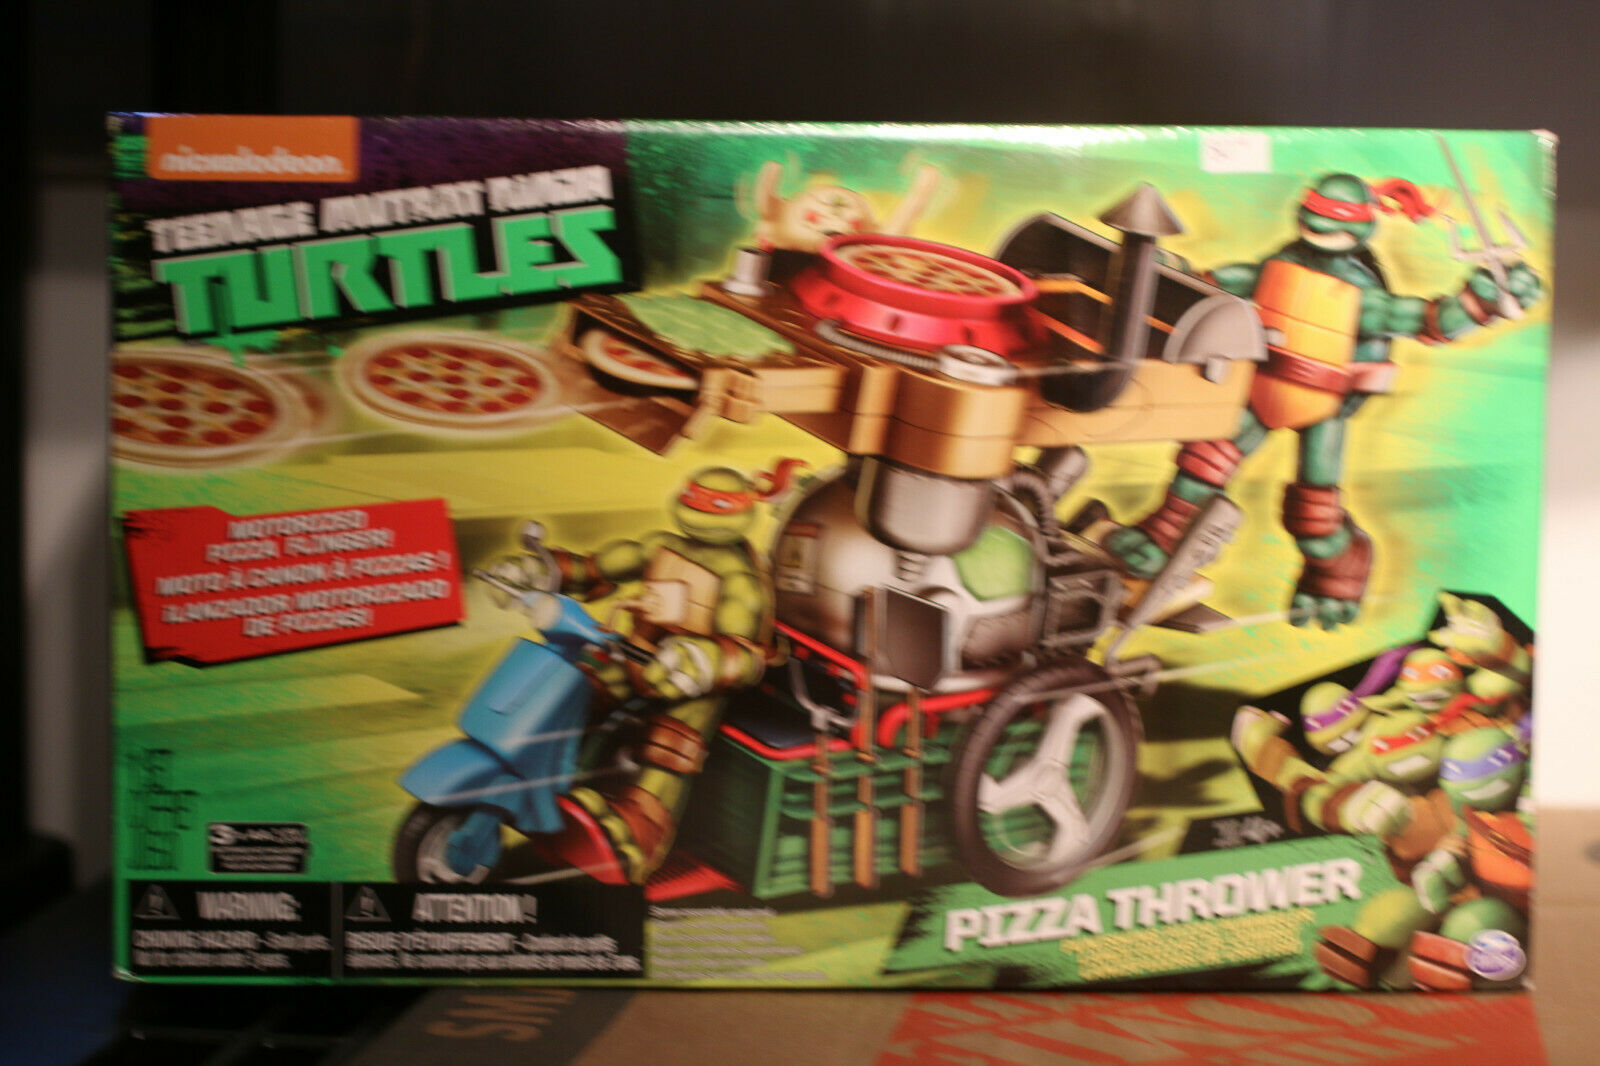 Teenage Mutant Ninja Turtles pizza thrower bike 2015 nickelodeon playmates NEW